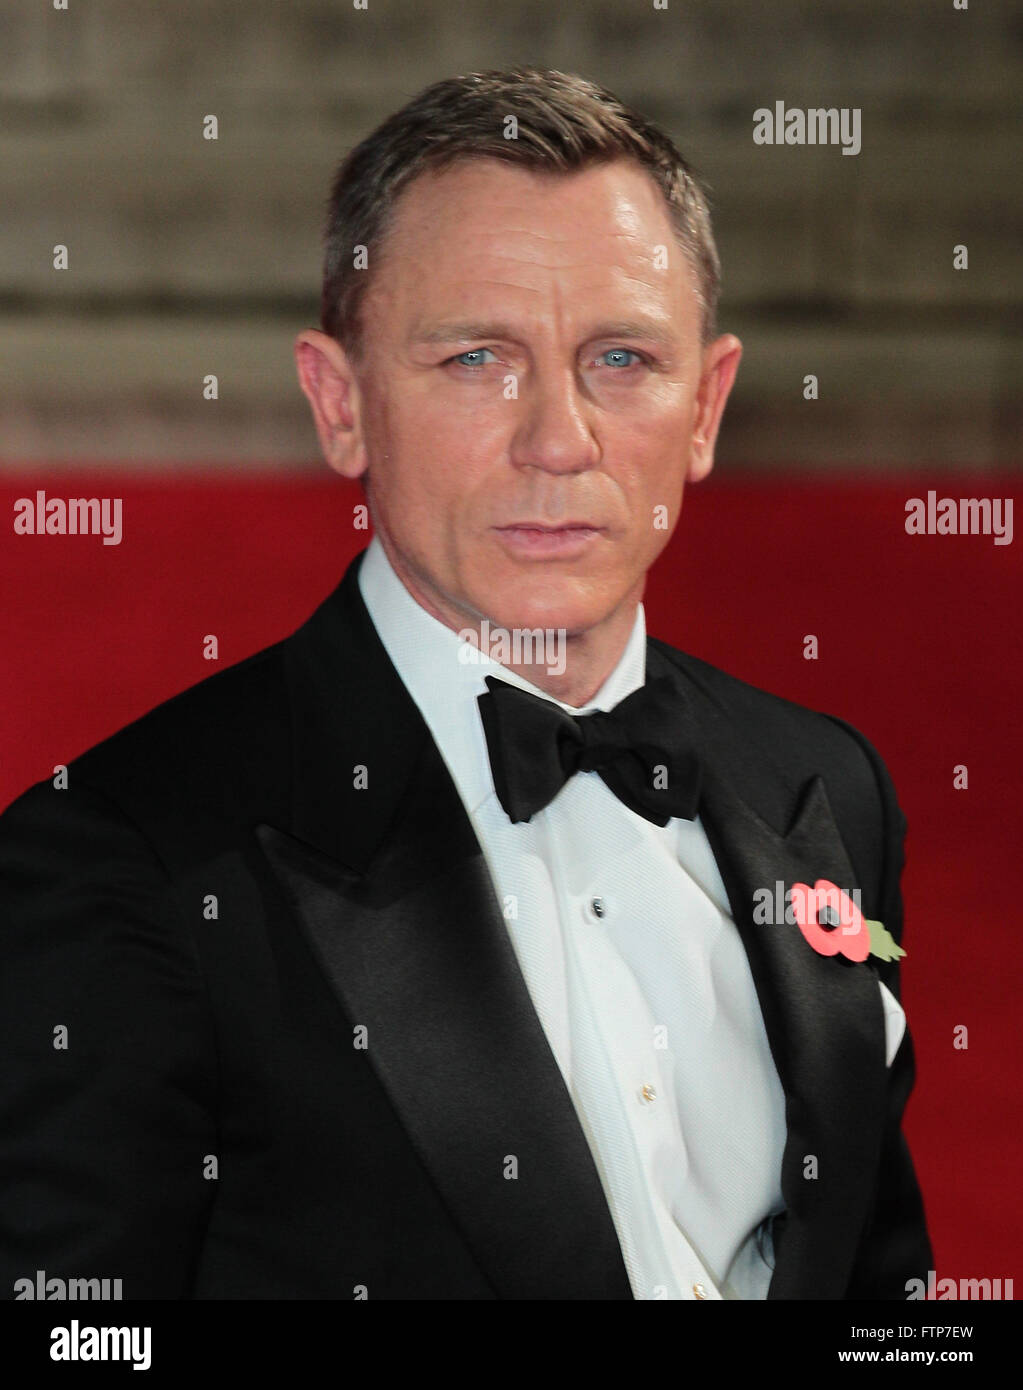 94af2f302c780c London, UK, 26th Oct 2015  Daniel Craig attends James Bond Spectre CTBF film